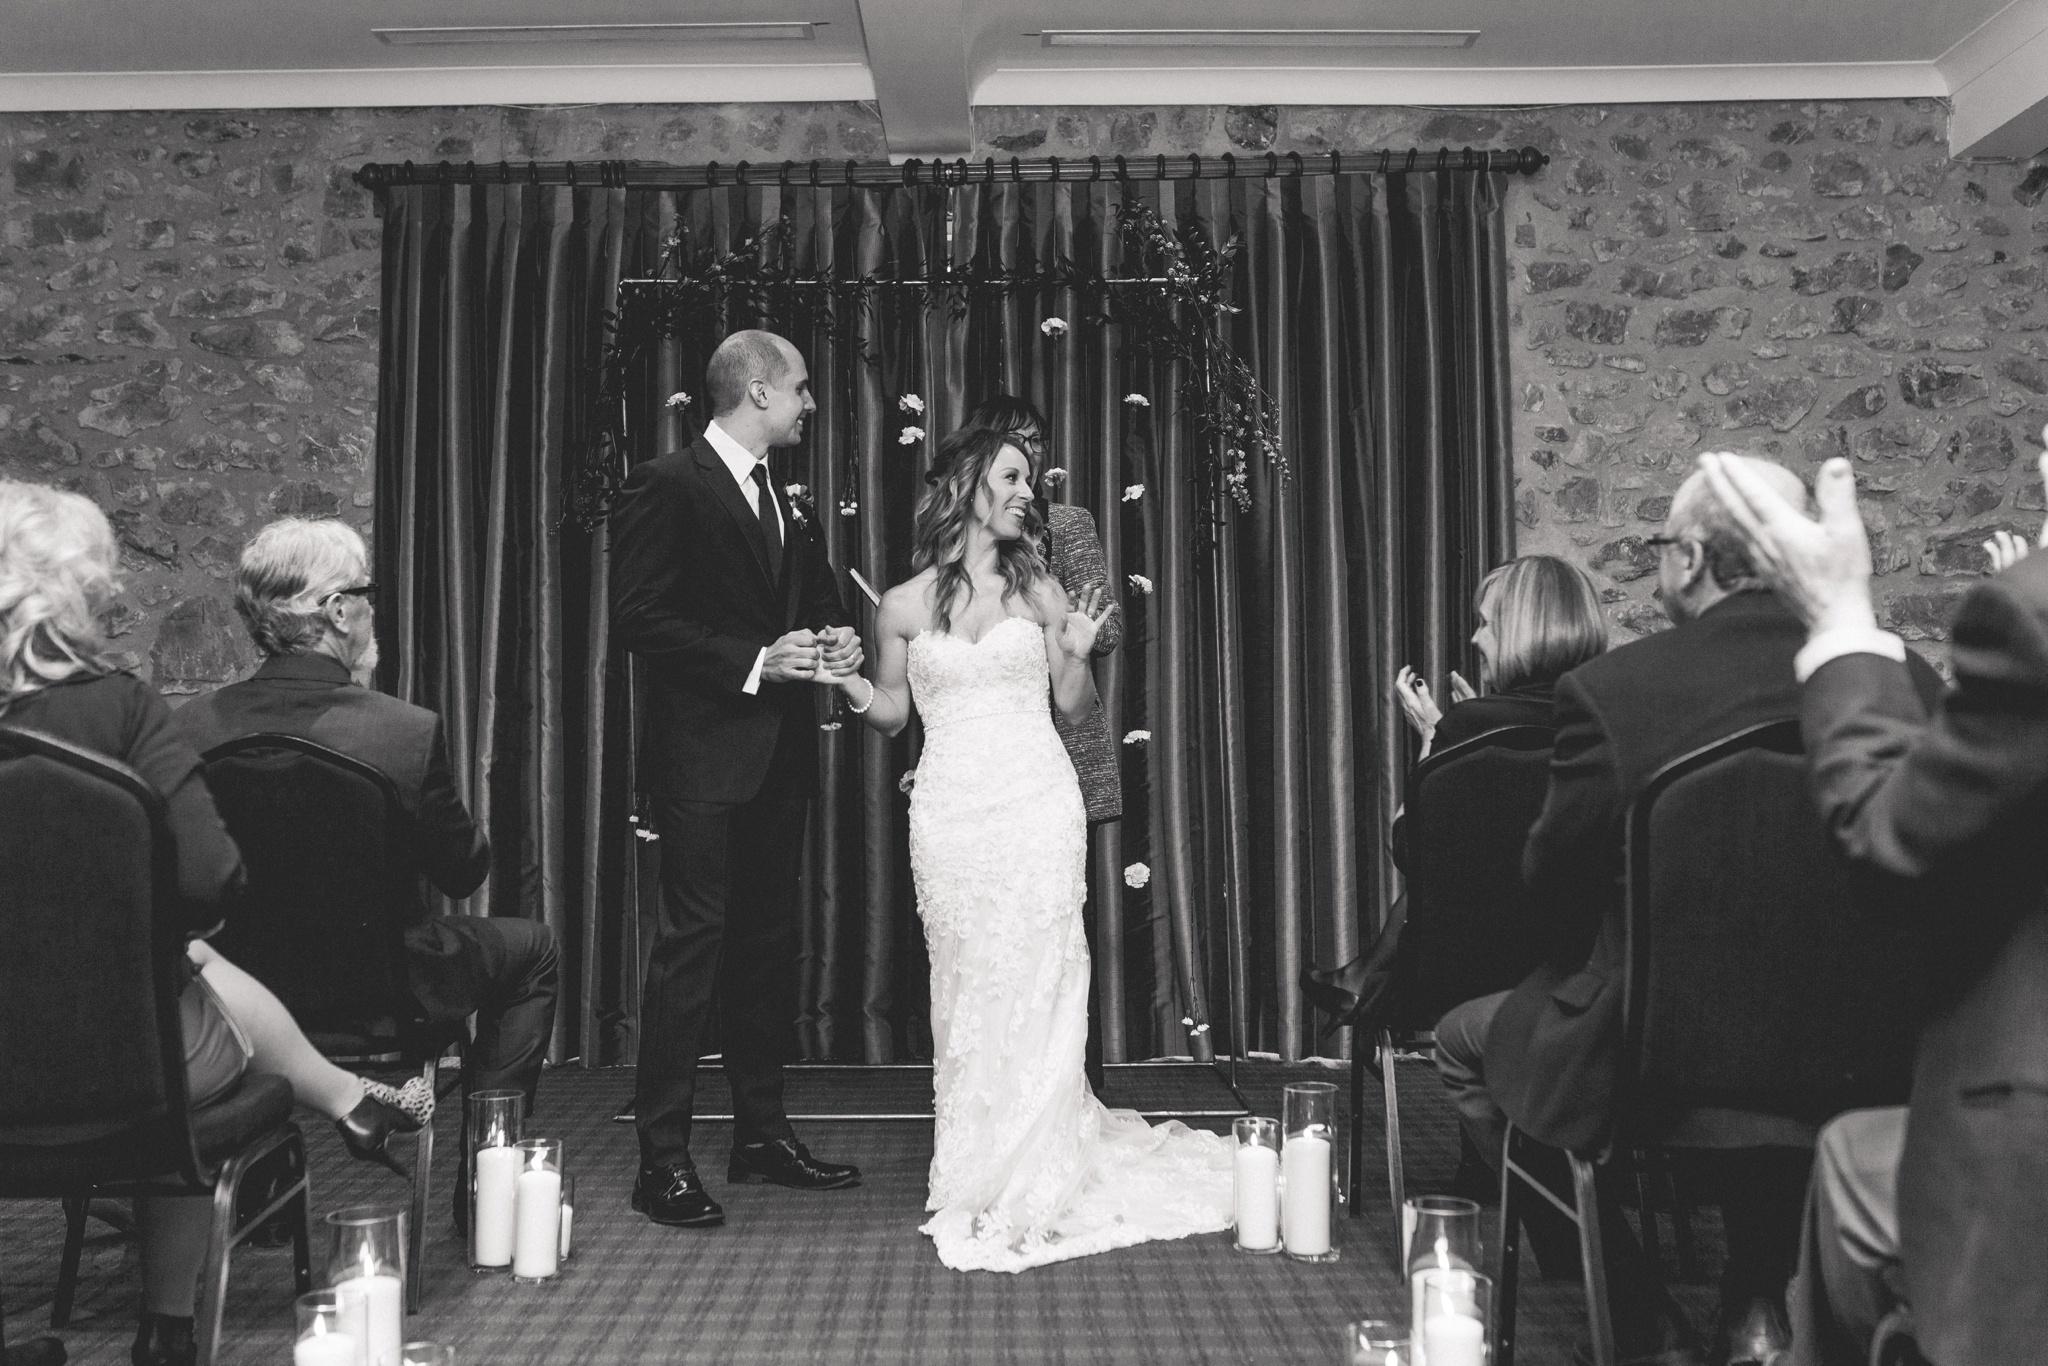 Caledon Wedding Photographer, Millcroft Spa Wedding